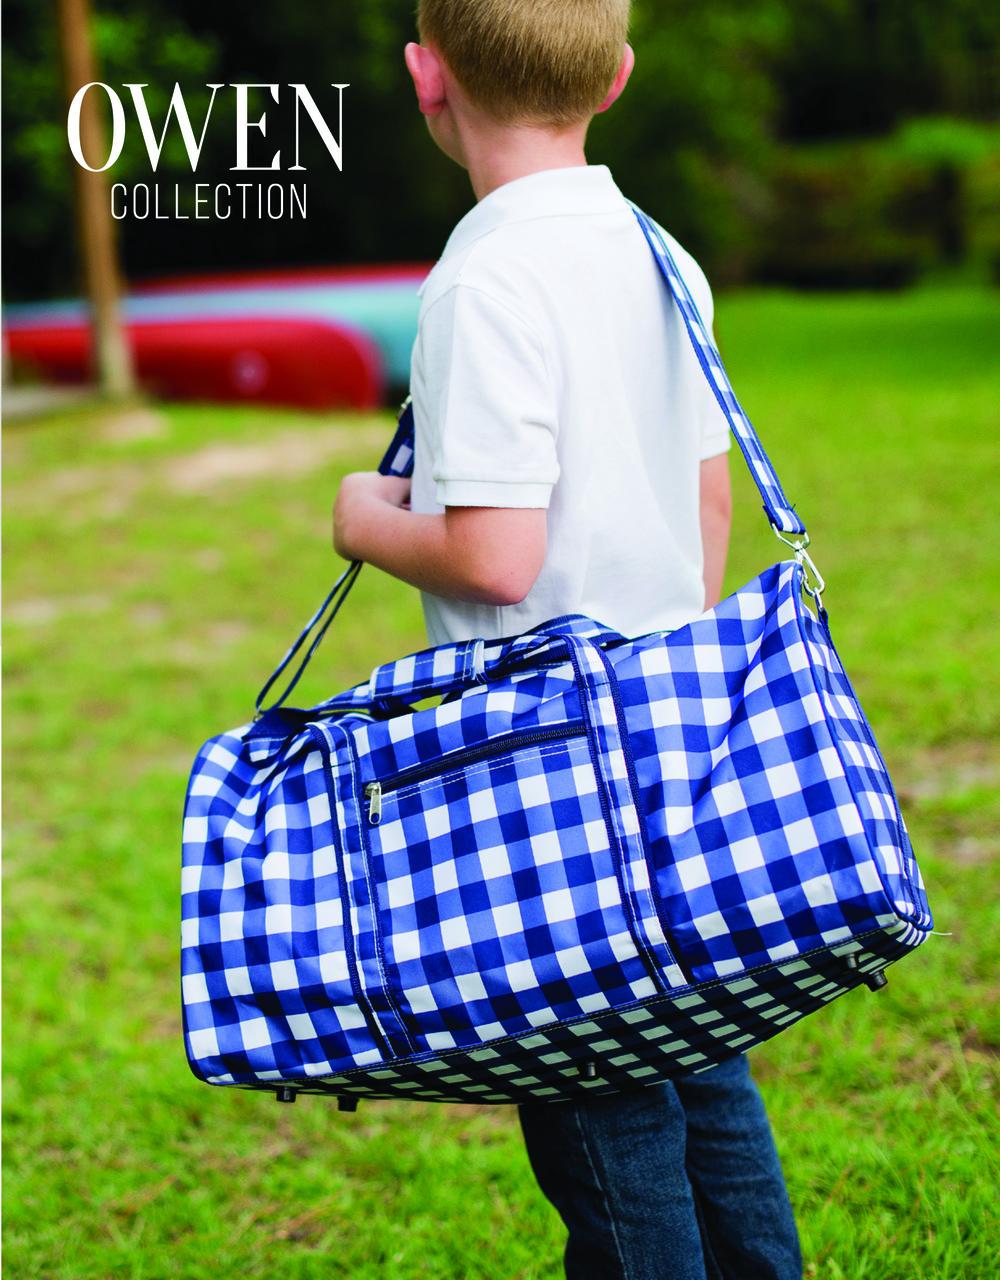 Owen2.jpg